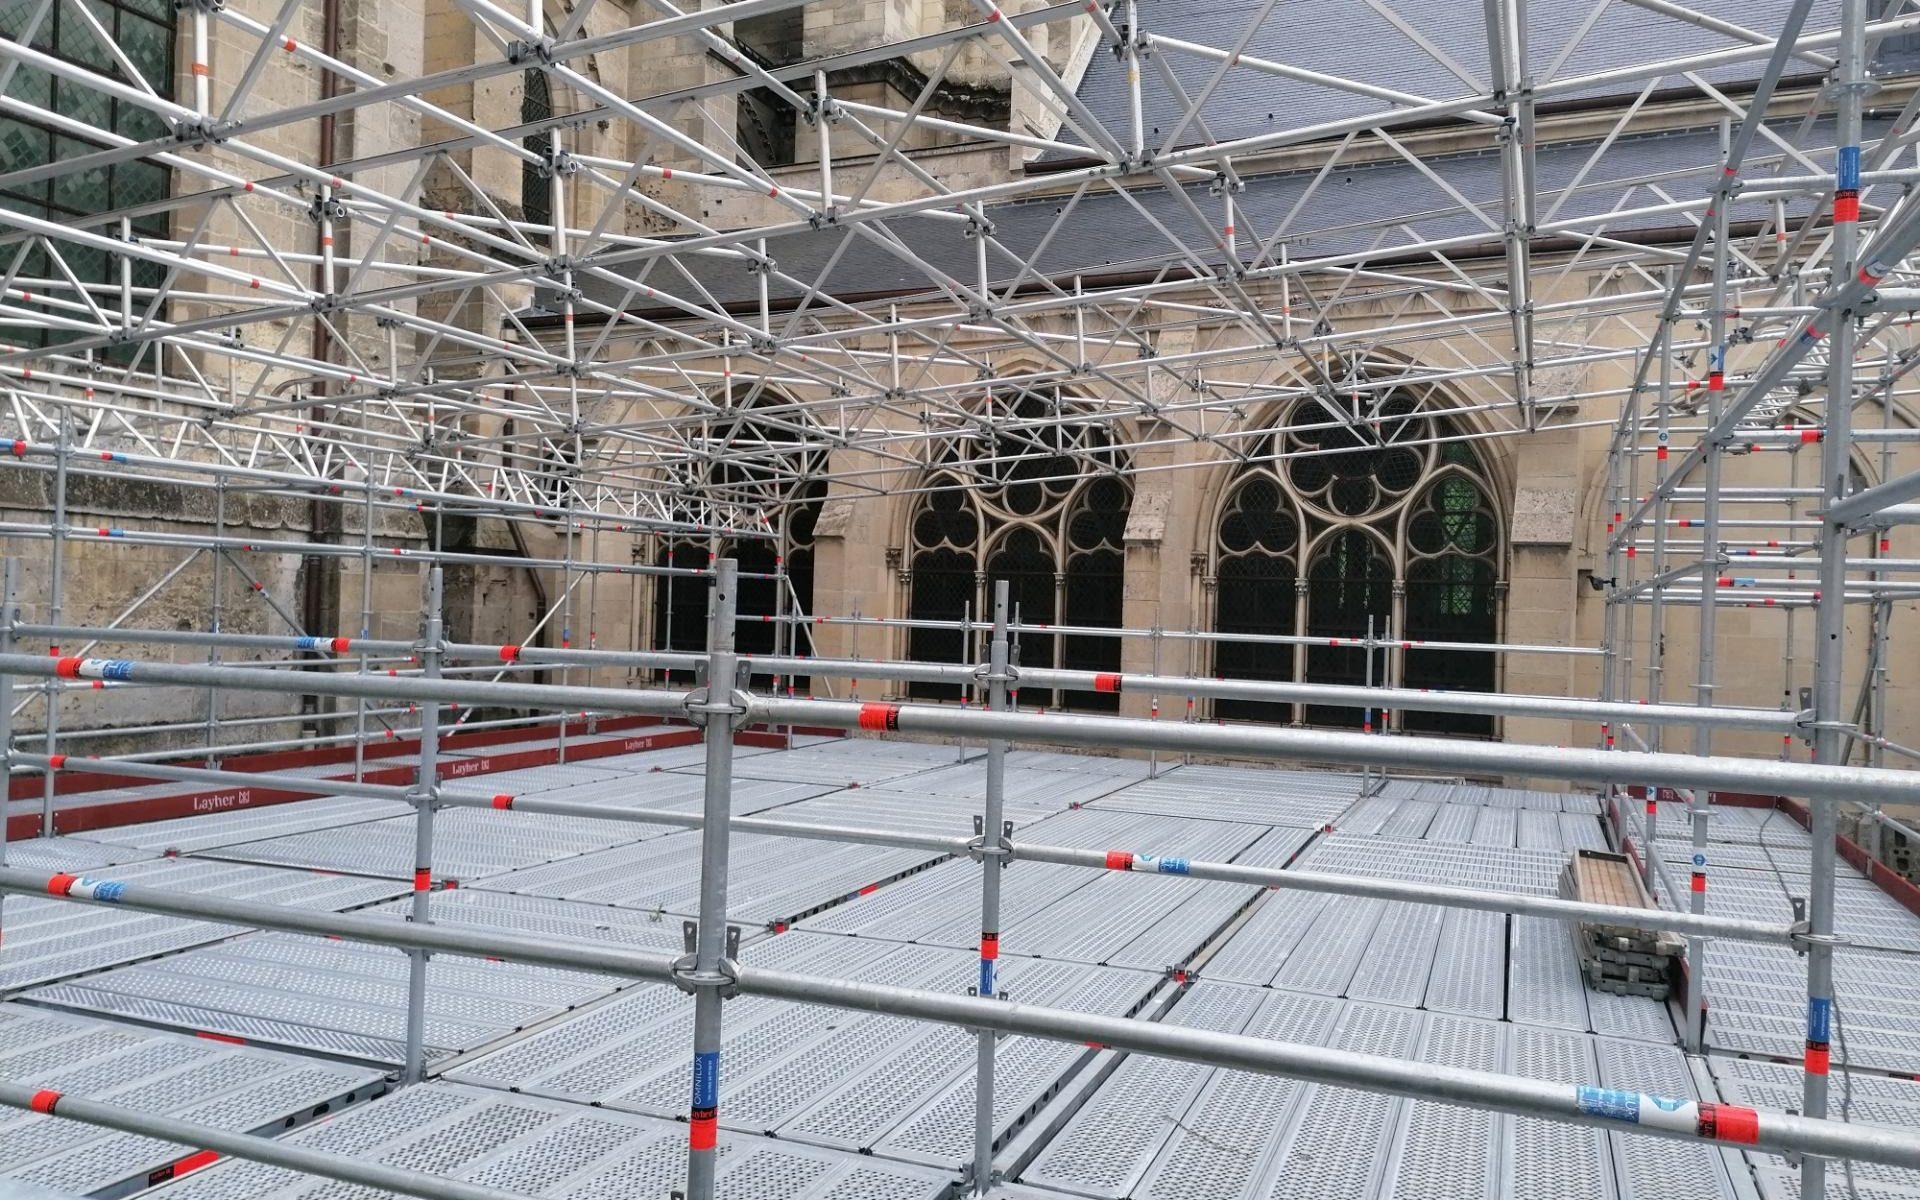 omniloca renovation cathedrale de soissons echafaudages et securite (1)